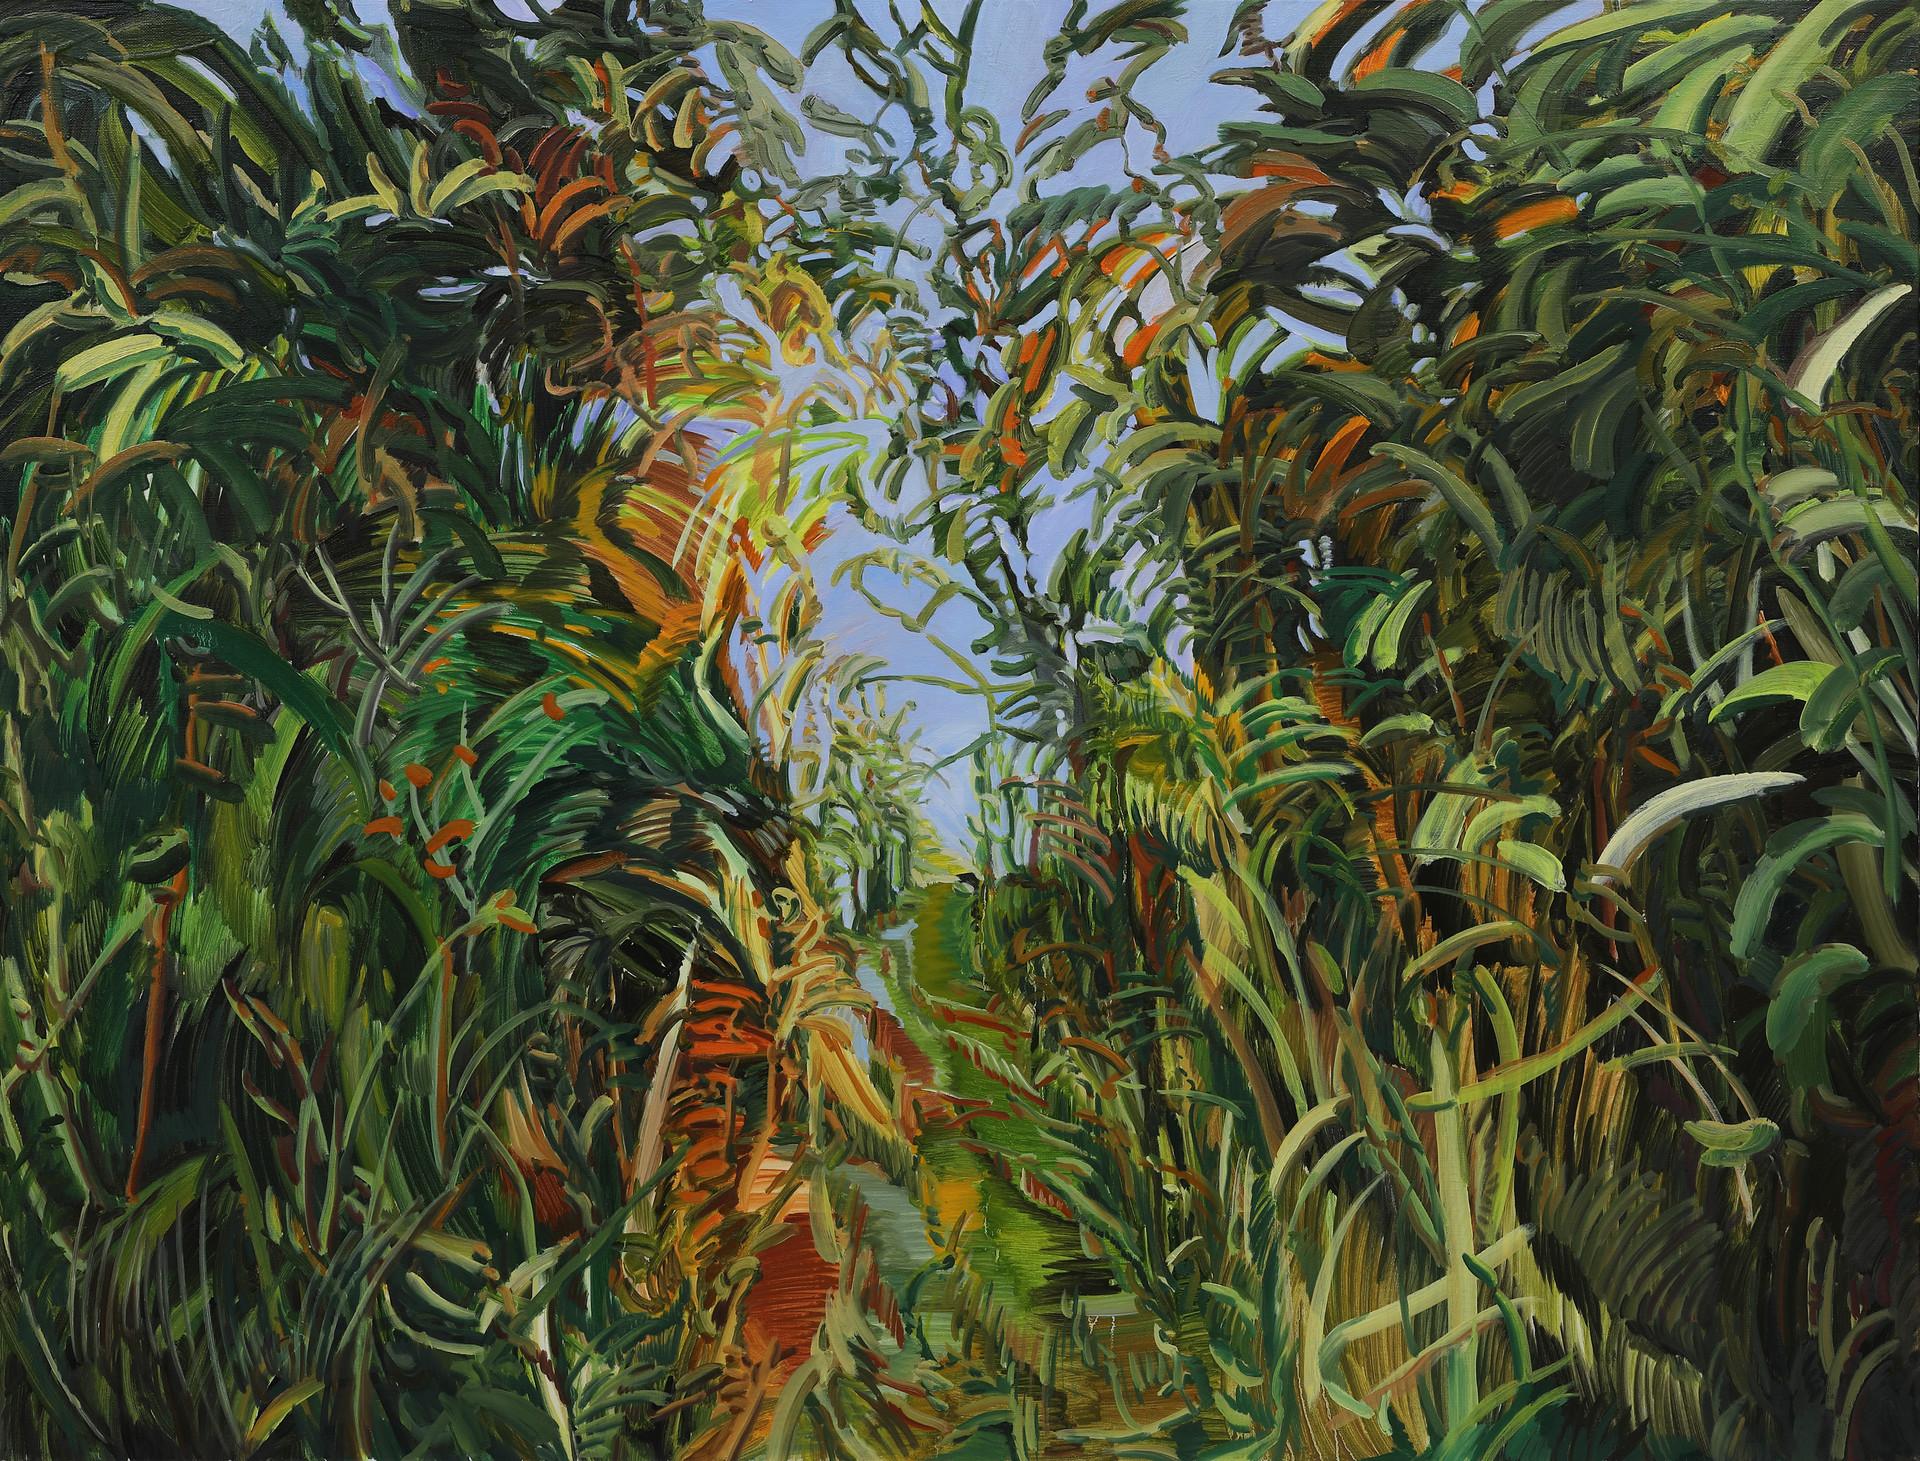 Green Wind, Oil on canvas, 91cm x 116.8cm, 2019